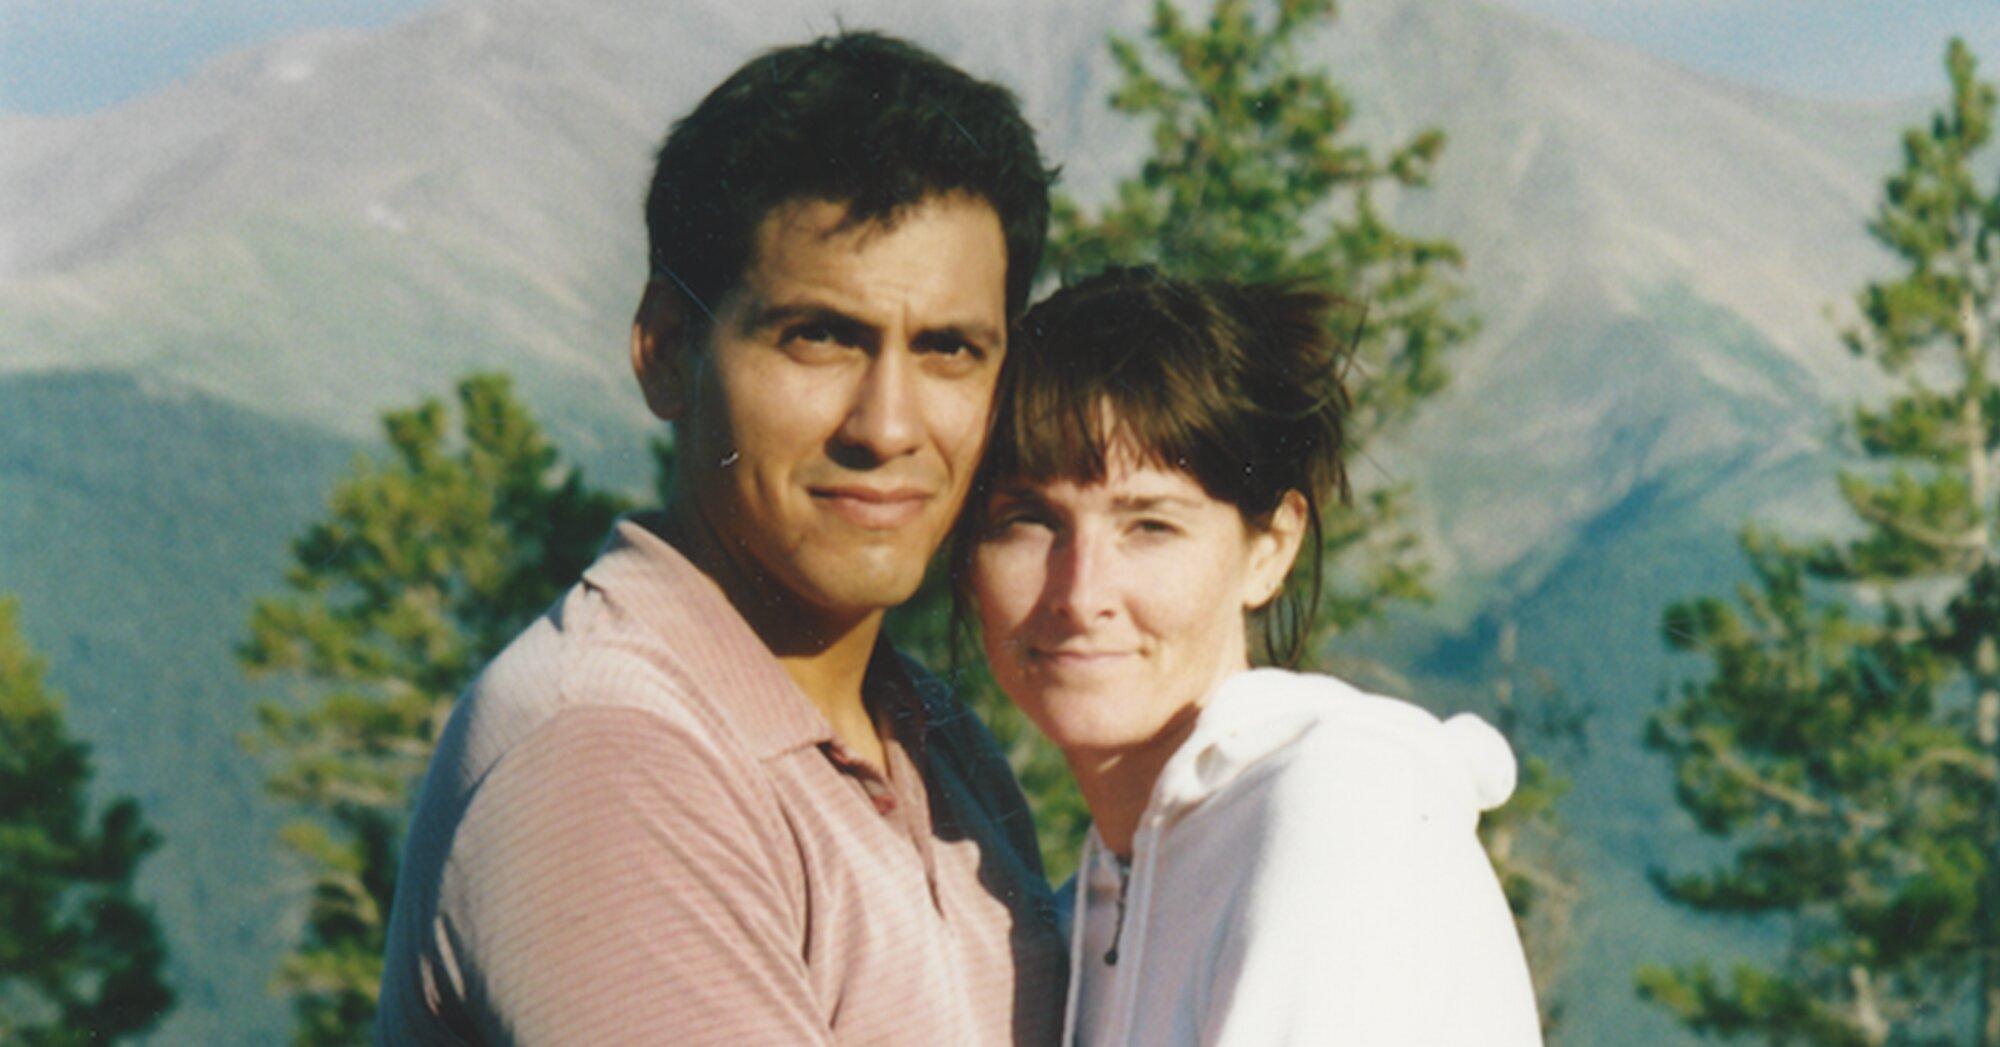 <em>Unsolved Mysteries</em> co-creator shares update on Rey Rivera case